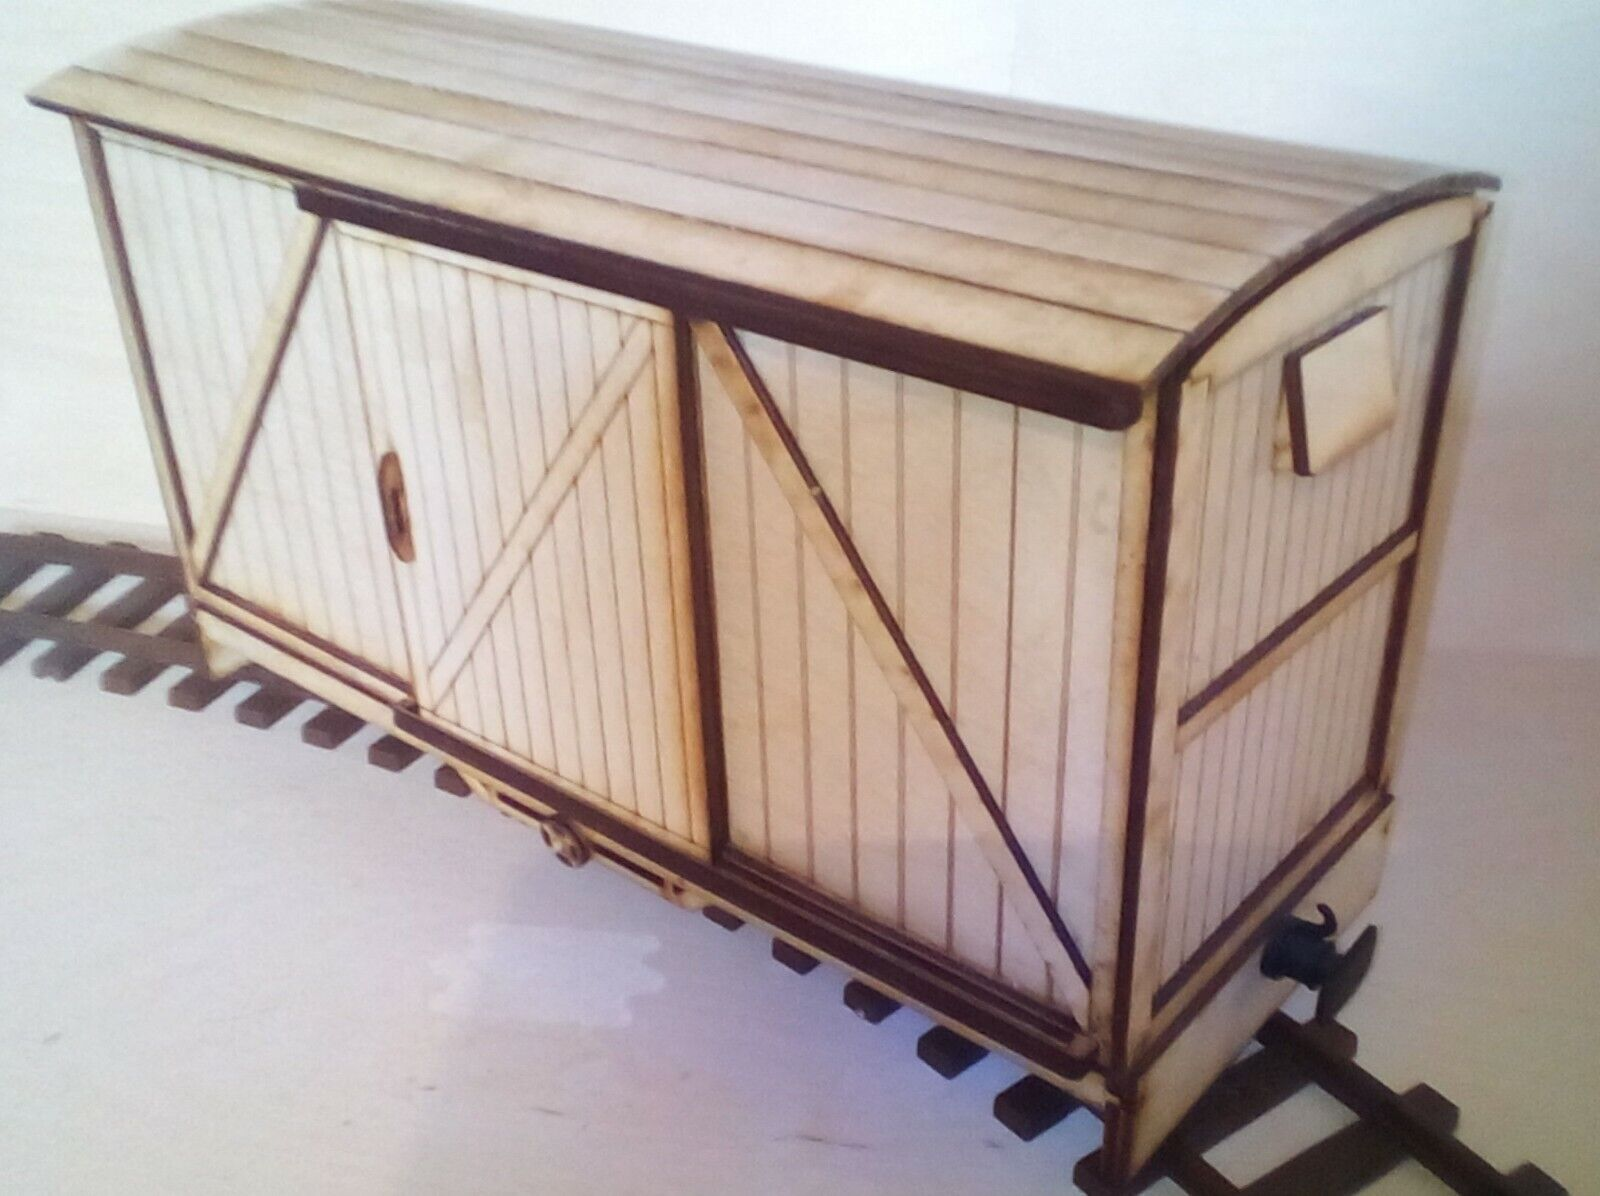 SEVEN EIGHTH SCALE BOGIE BOX VAN